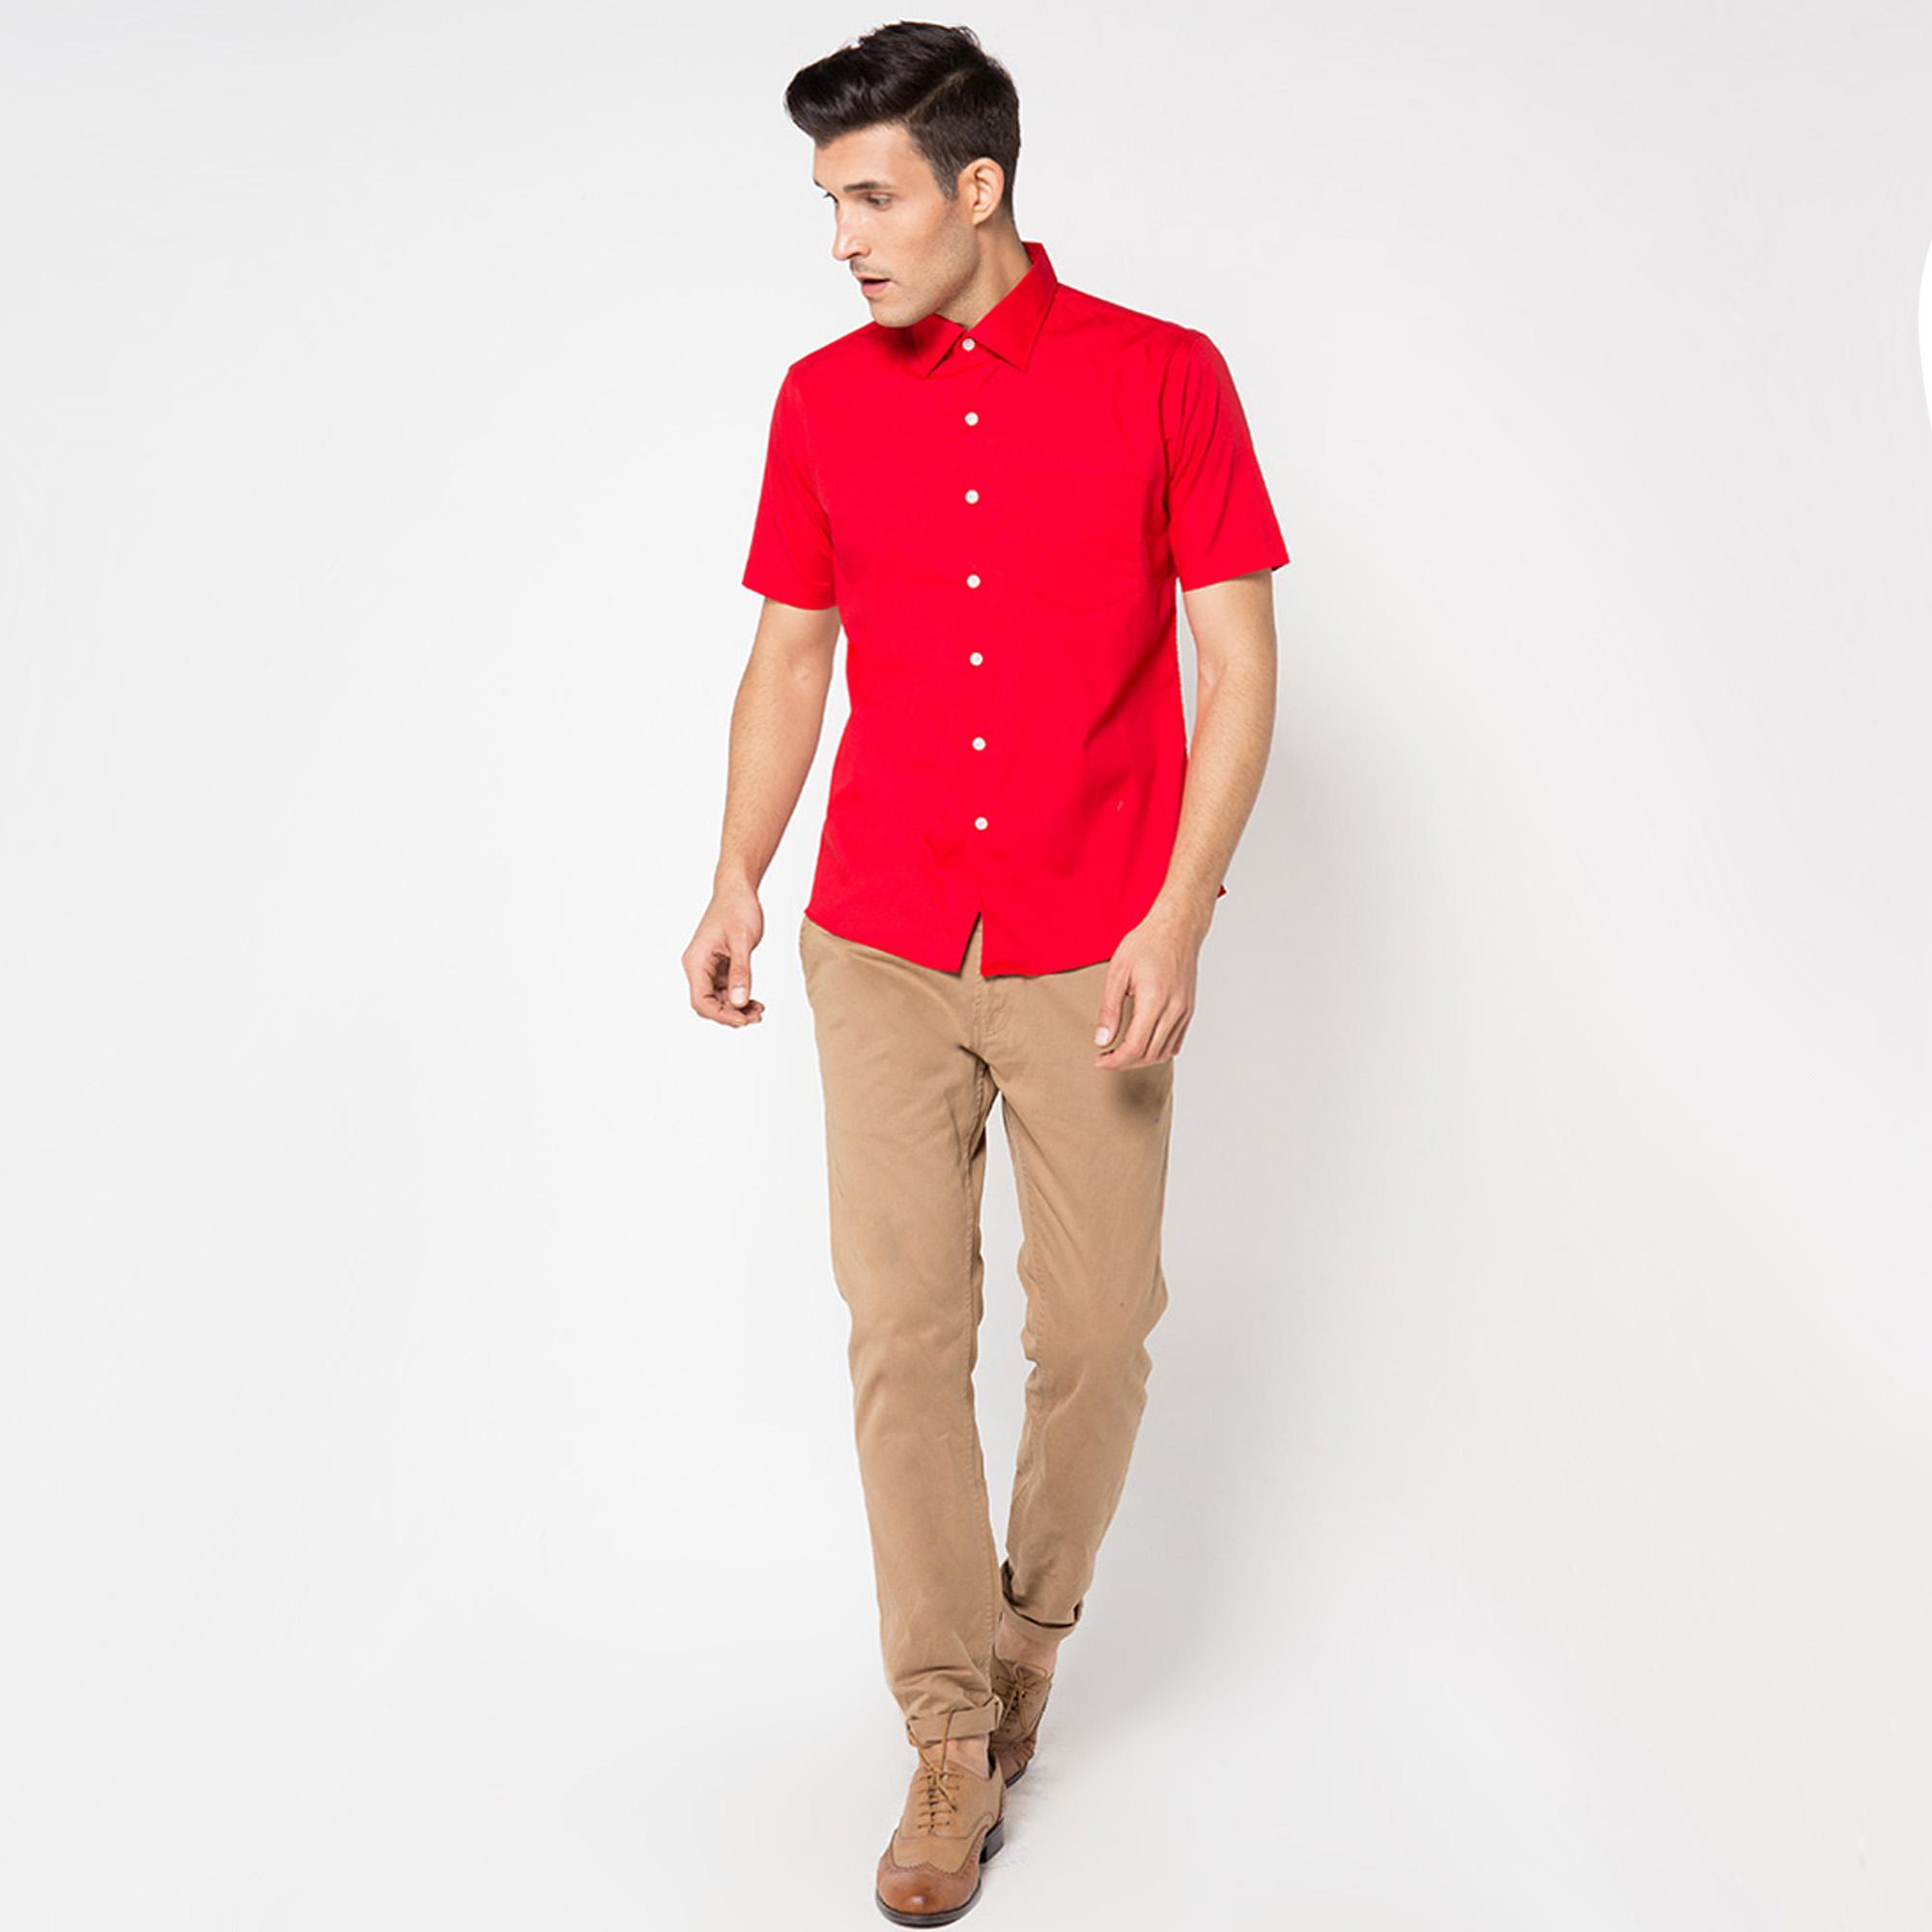 Vm Kemeja Pria Polos Slimfit Basic Pendek Biru Muda Soft Blue Short Baju Kekinian Fonzi Softblue Ot Katun Stretch Merah Red Shirt